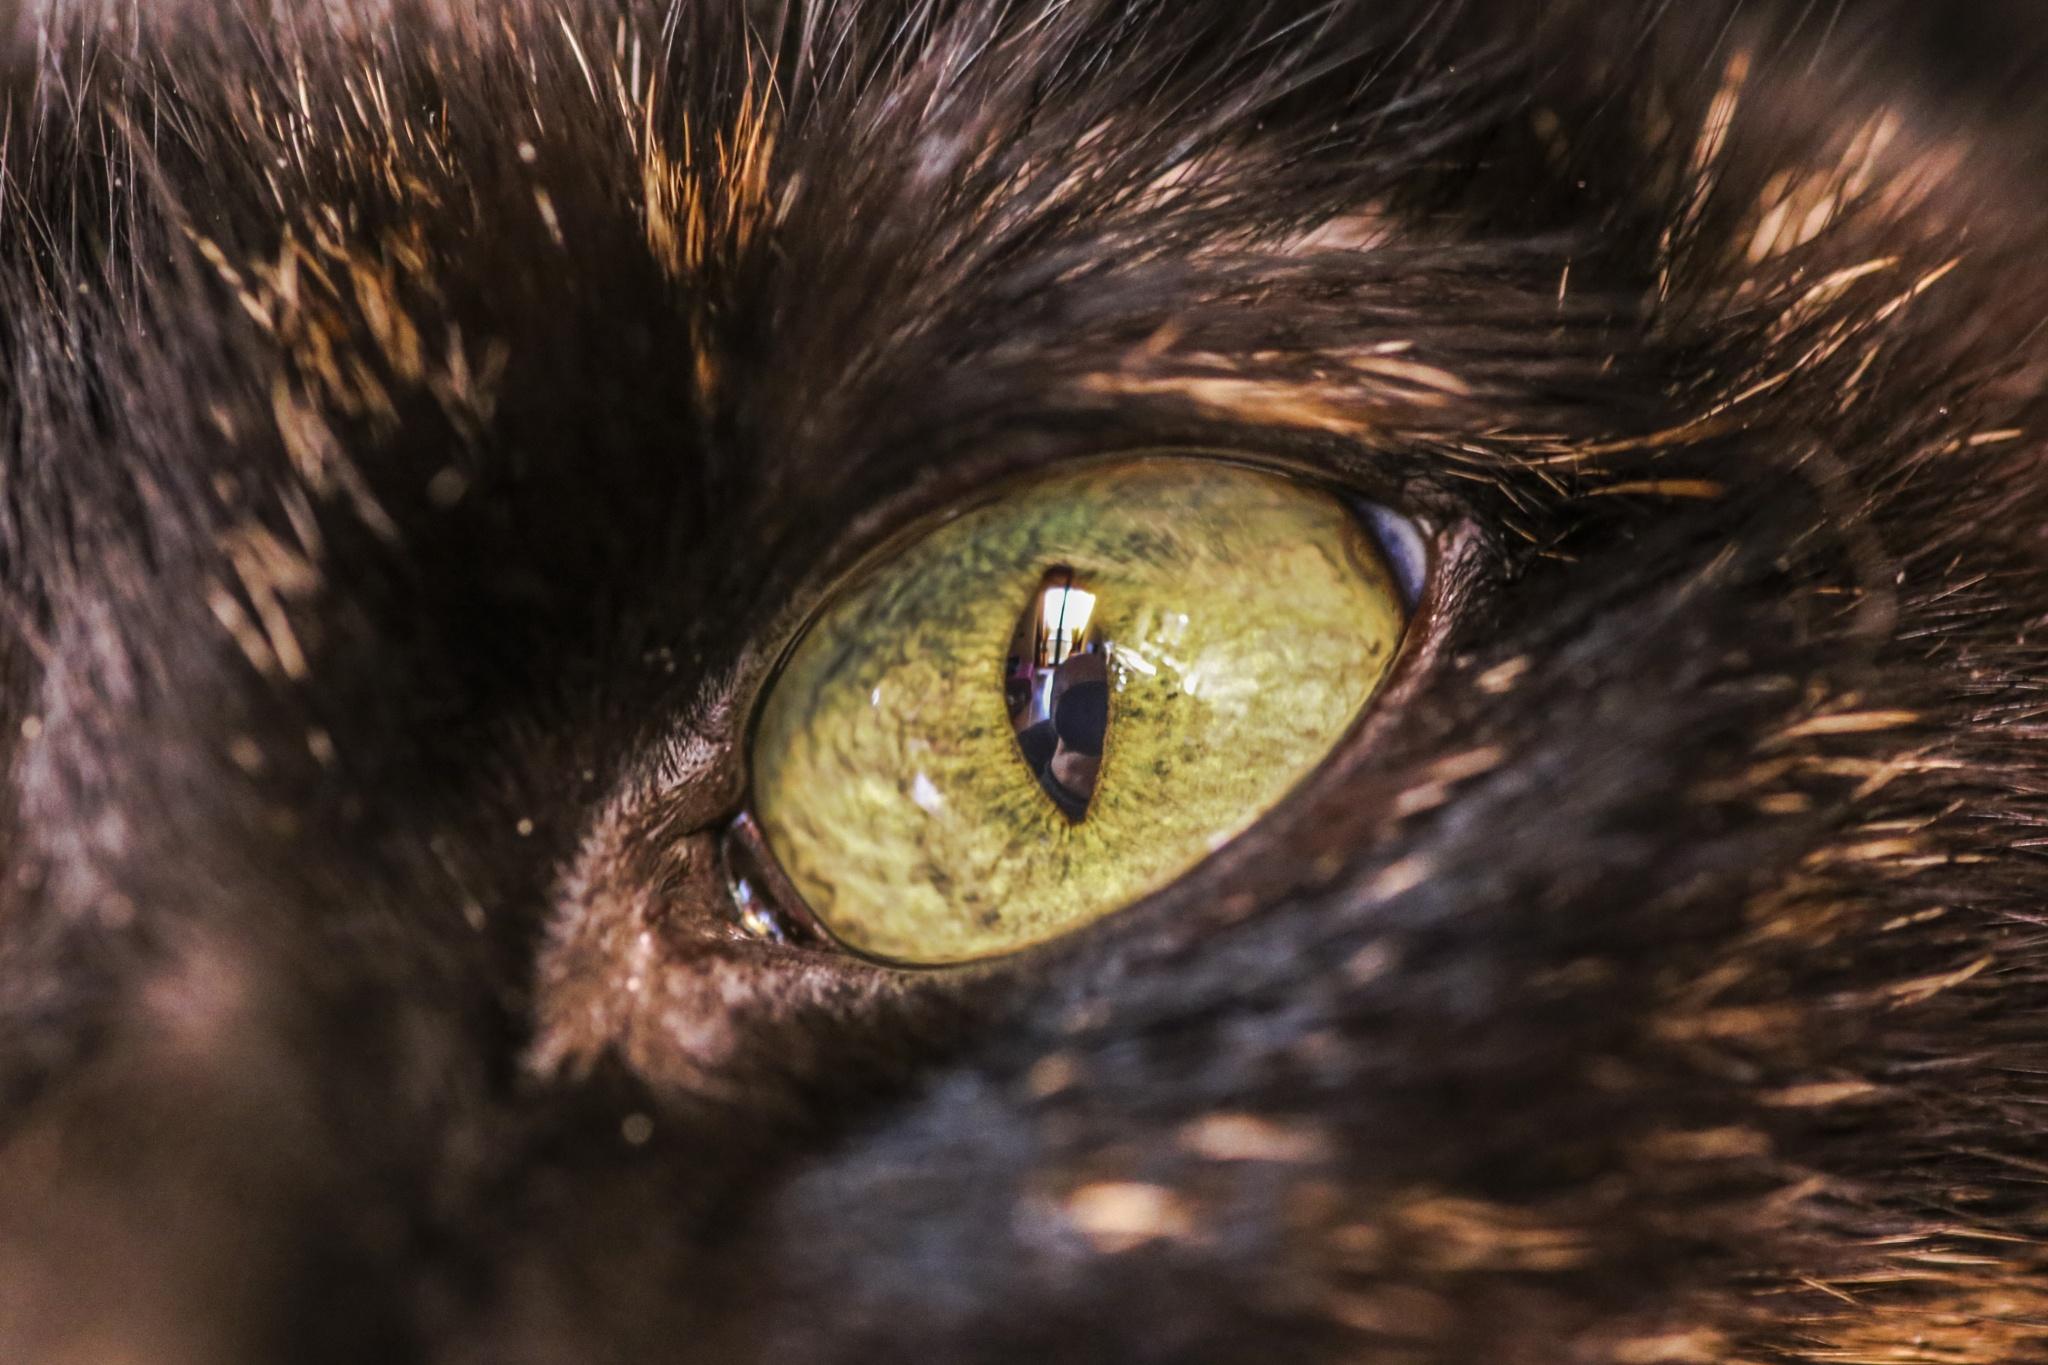 Cat's eye by Davide 'Dado Dalle Ave